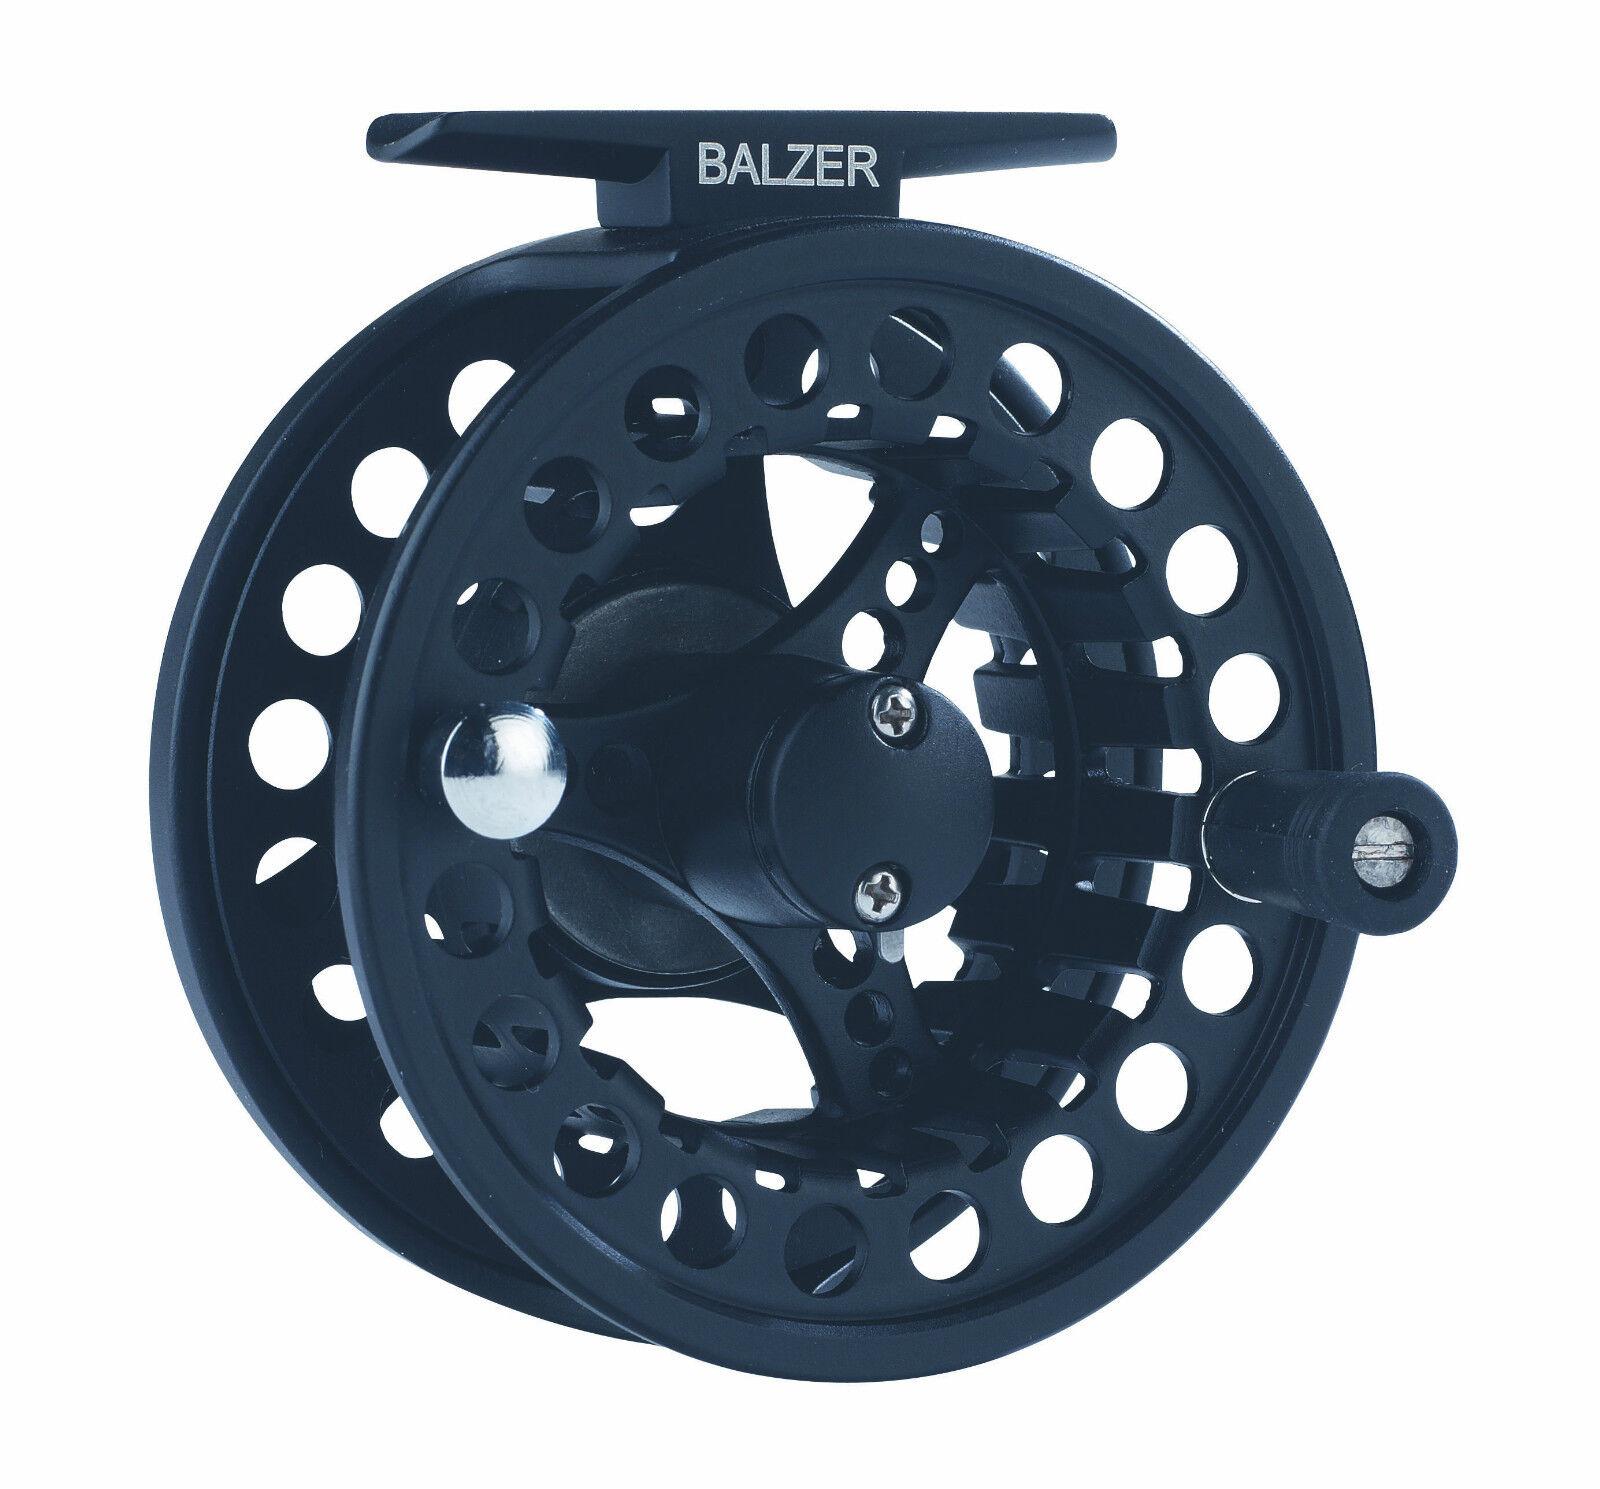 Balzer - Tactics - Balzer FLY 7/8 Großkernrolle 10f5f4